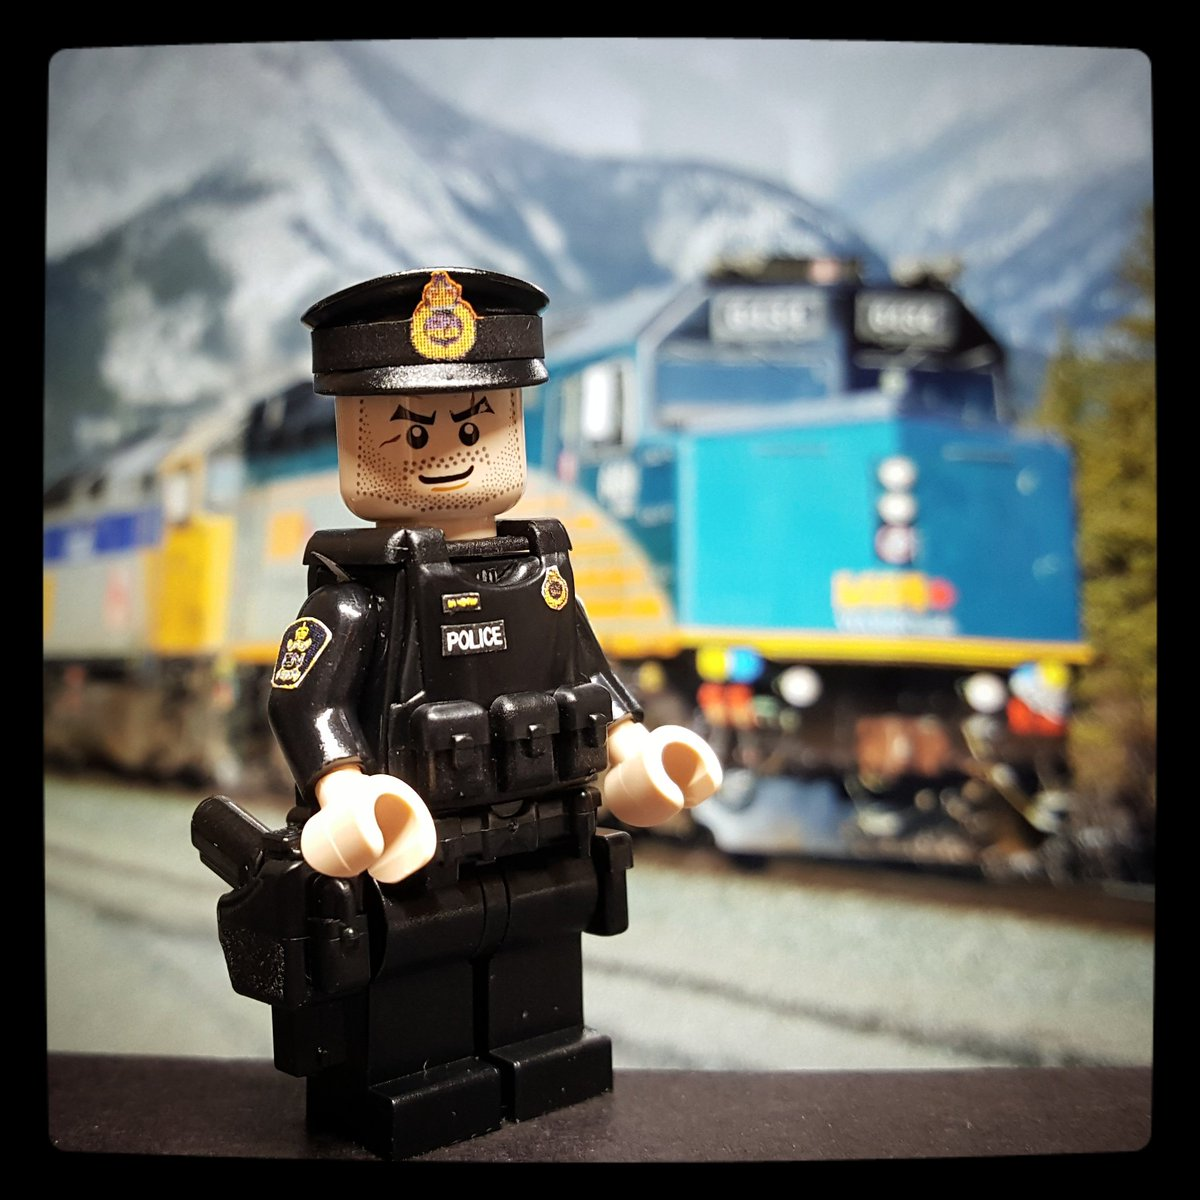 Lego gta police